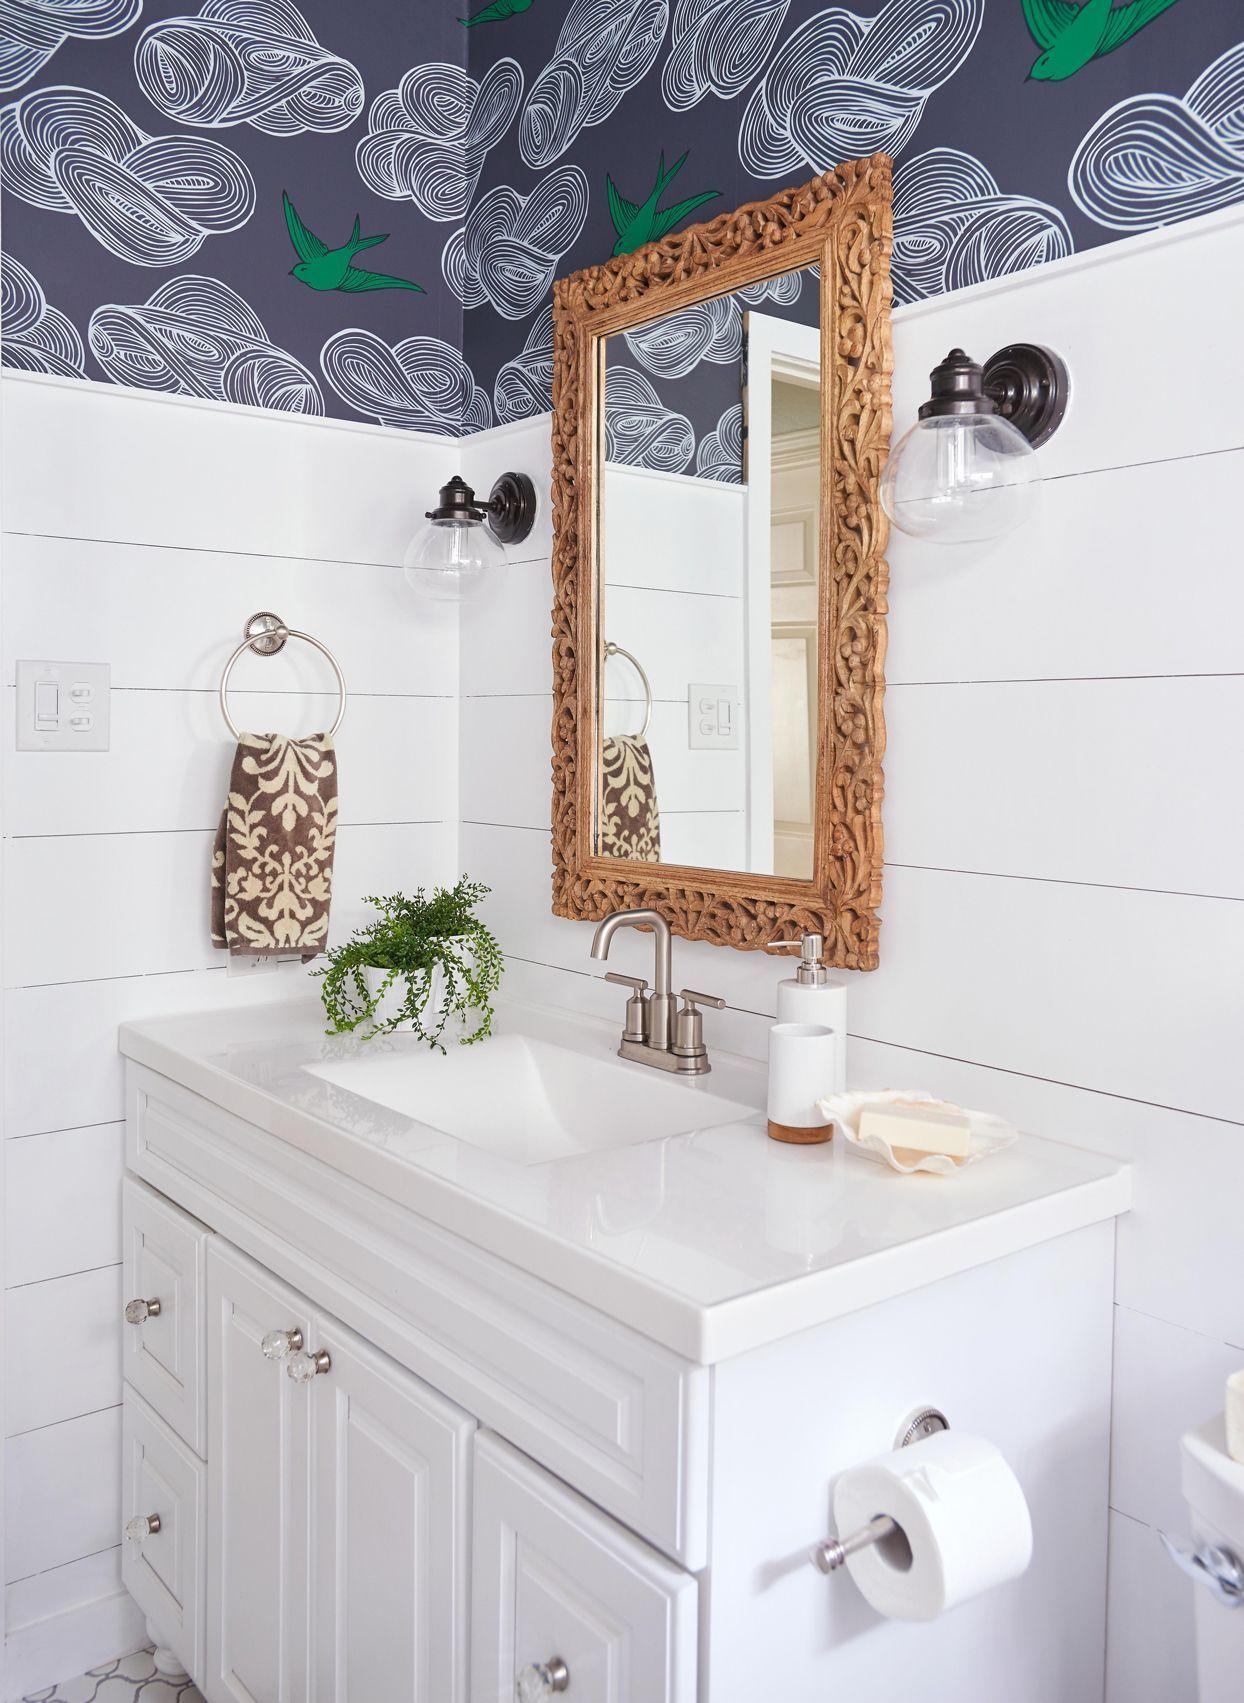 Stylish Bathroom Color Schemes In 2021 Bathroom Wall Coverings Bathroom Color Schemes Stylish Bathroom